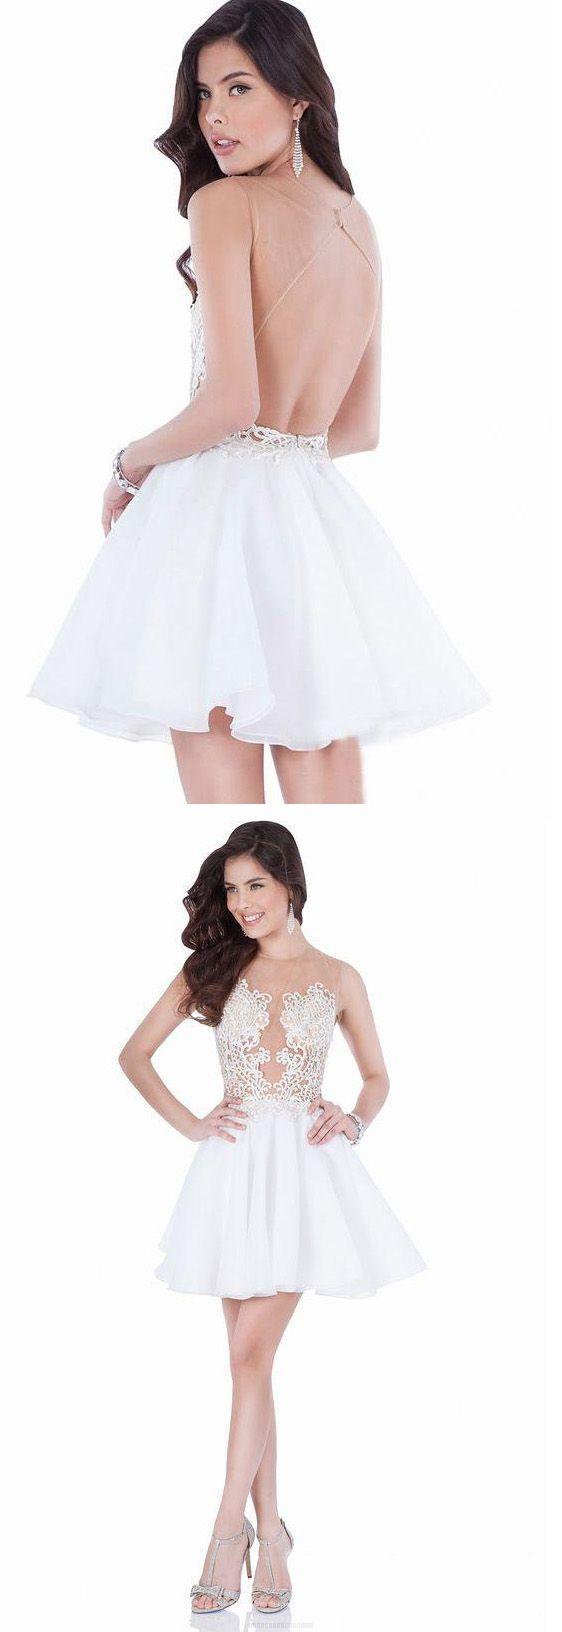 Short Prom Dresses White Prom Dresses Sexy Prom dresses Prom